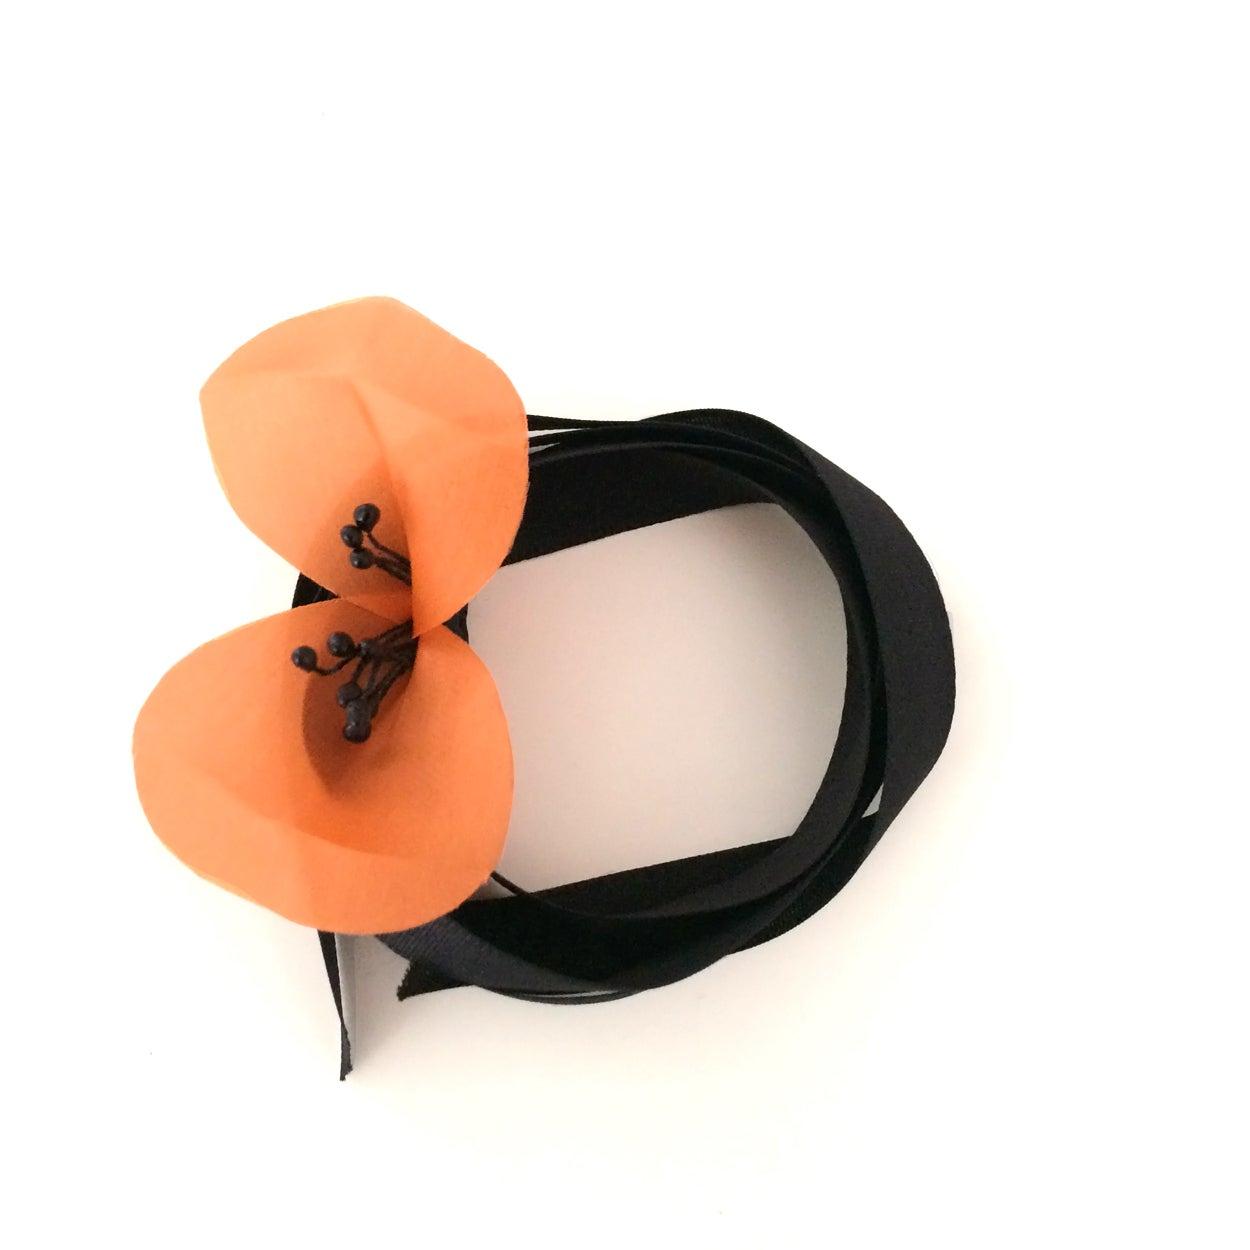 Image of NOUVEAUTES Headband Organdi de soie